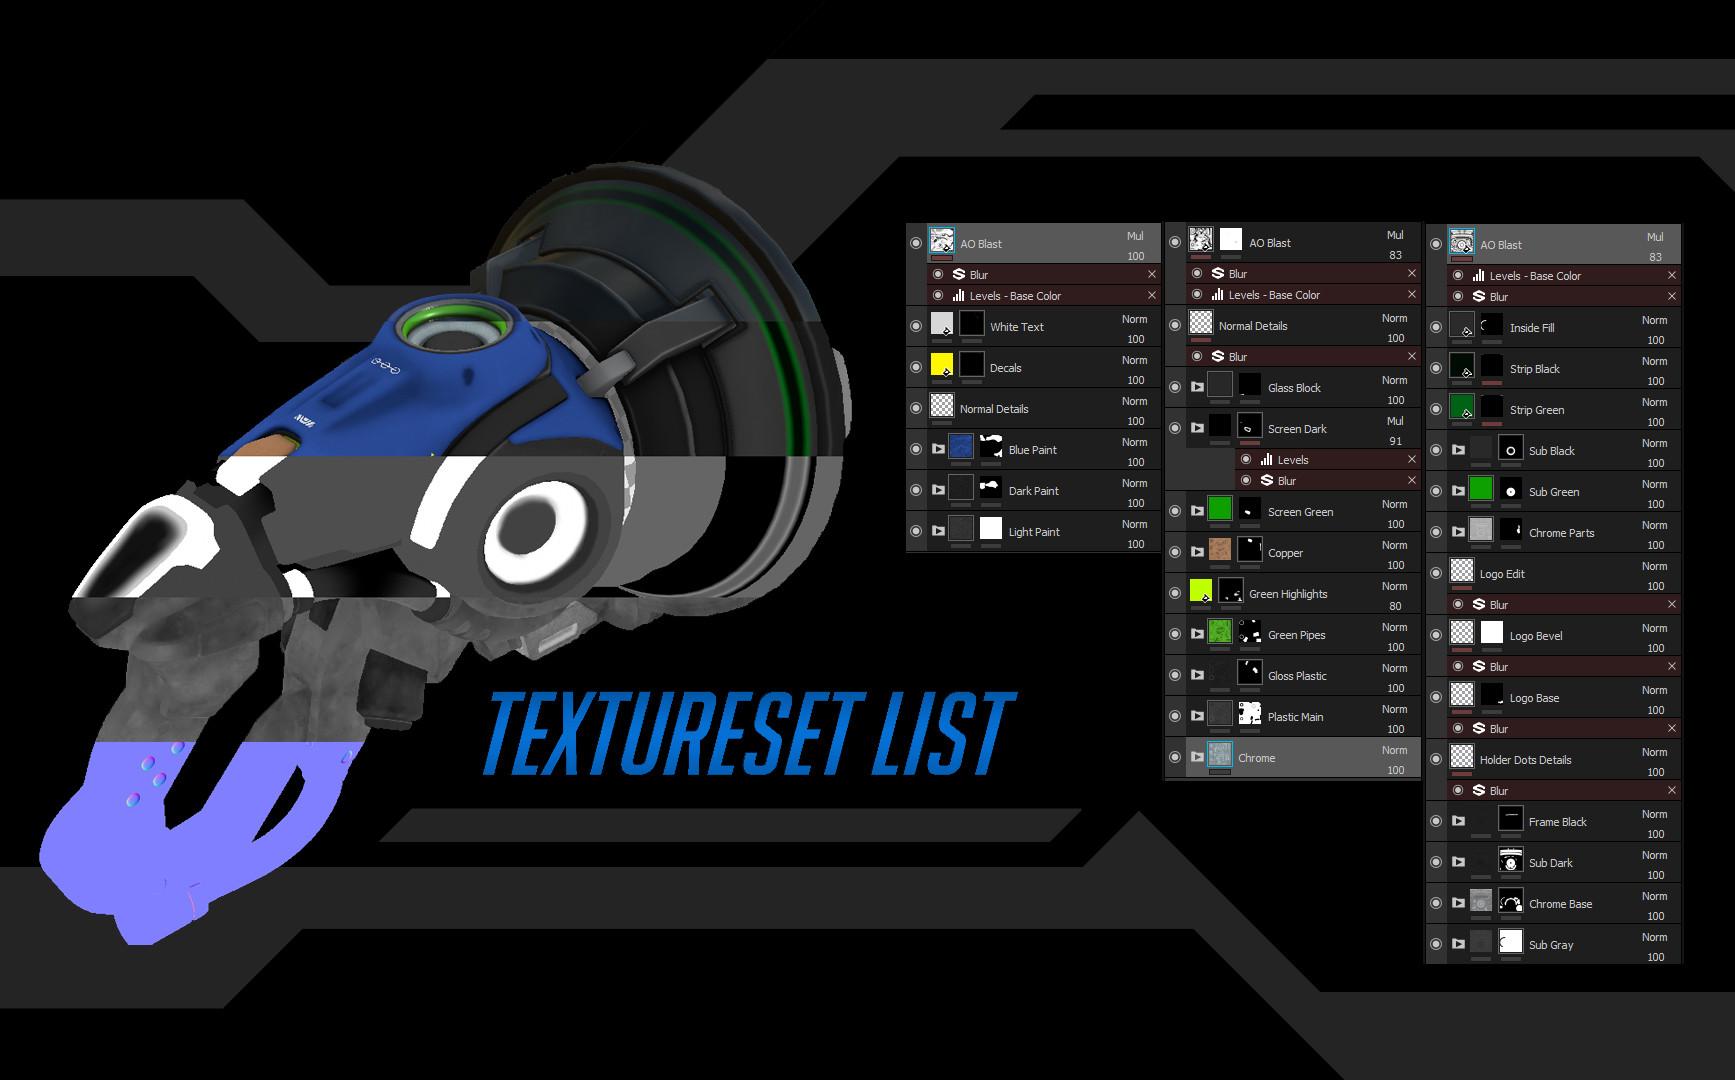 Rakan khamash weapon textureset list